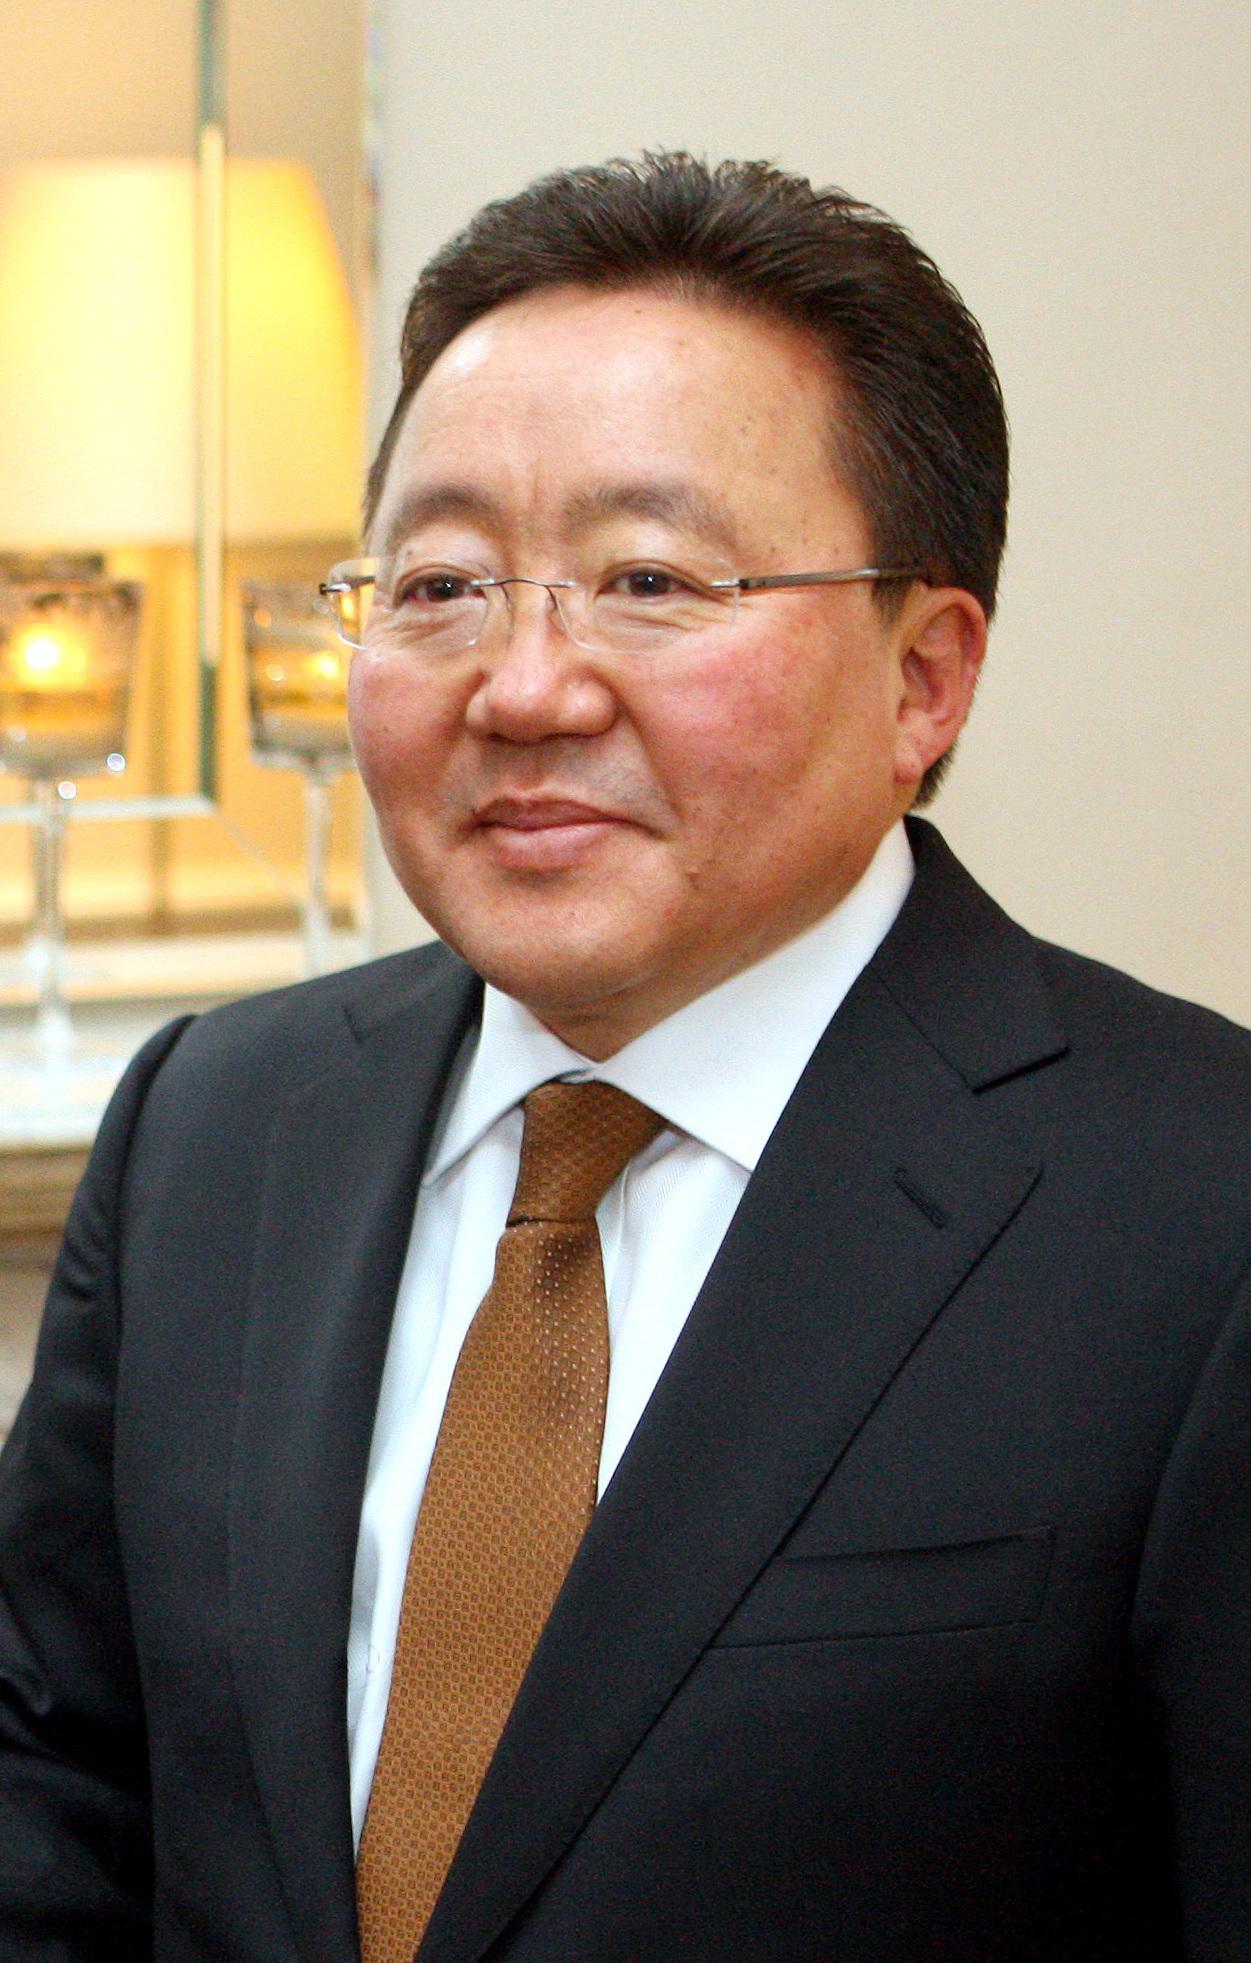 2013 Mongolian presidential election